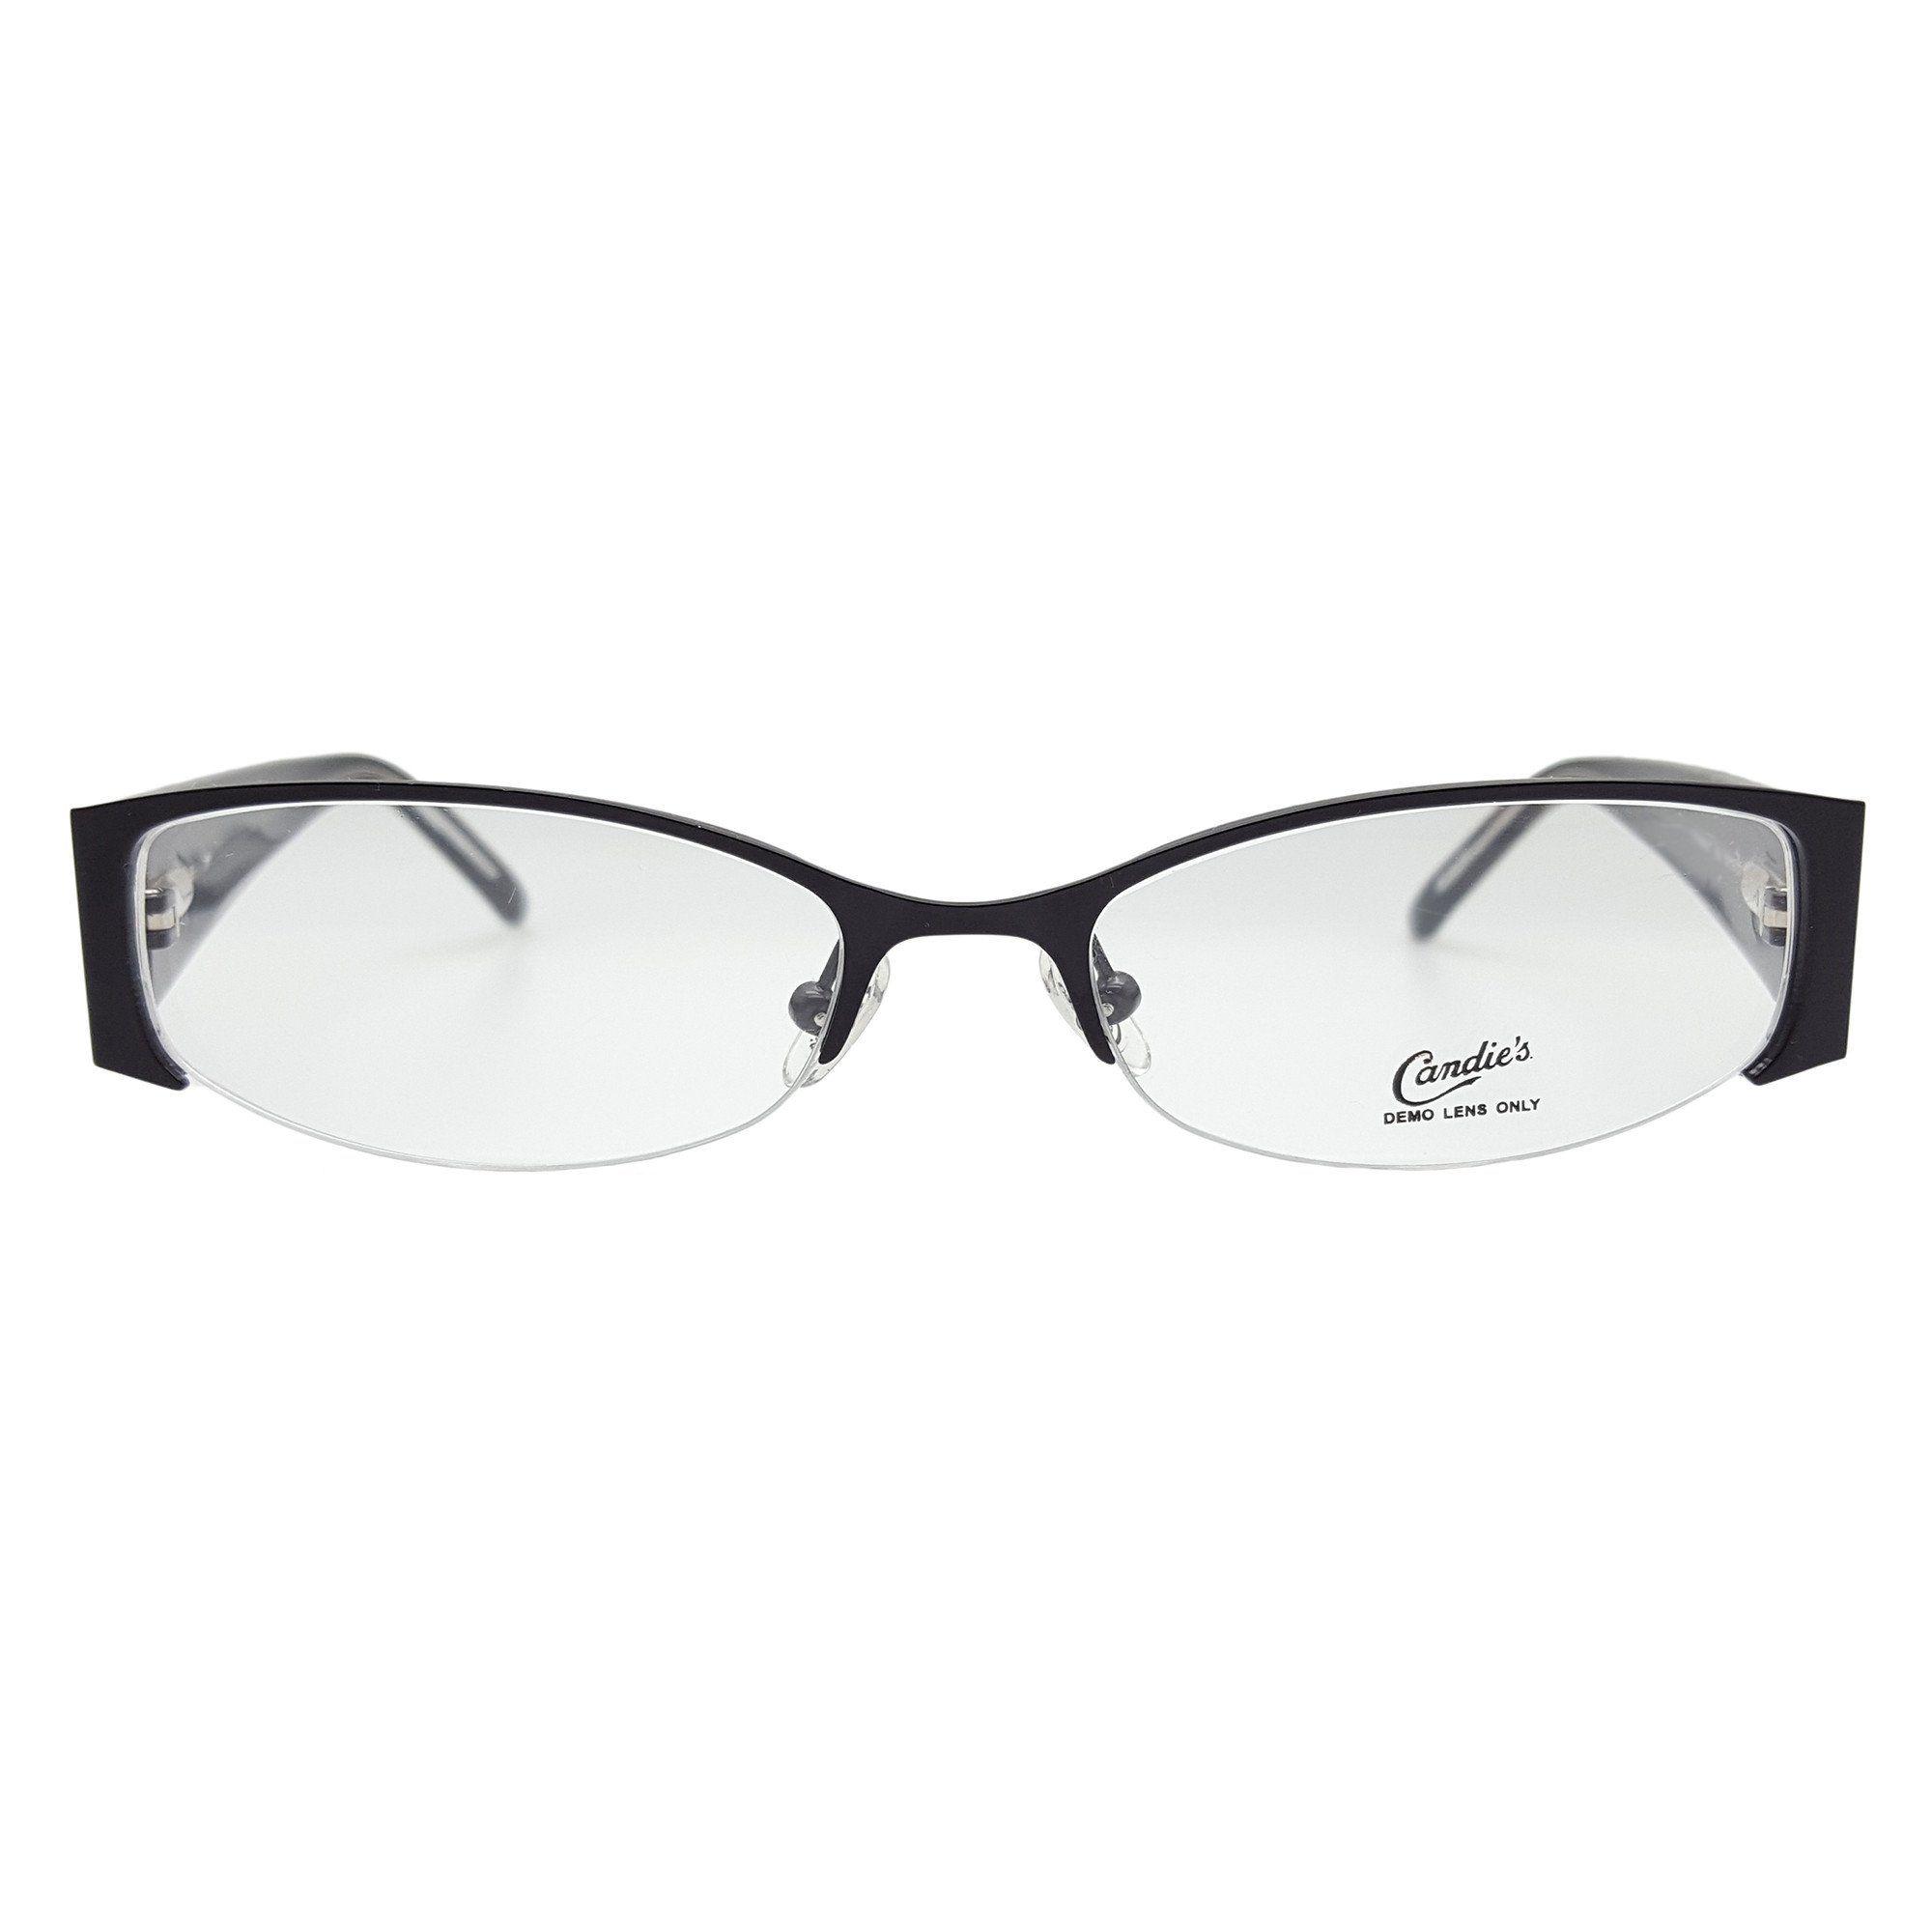 9cf76da2c3b Candie s Women s C Vivienne Eyeglasses Frames